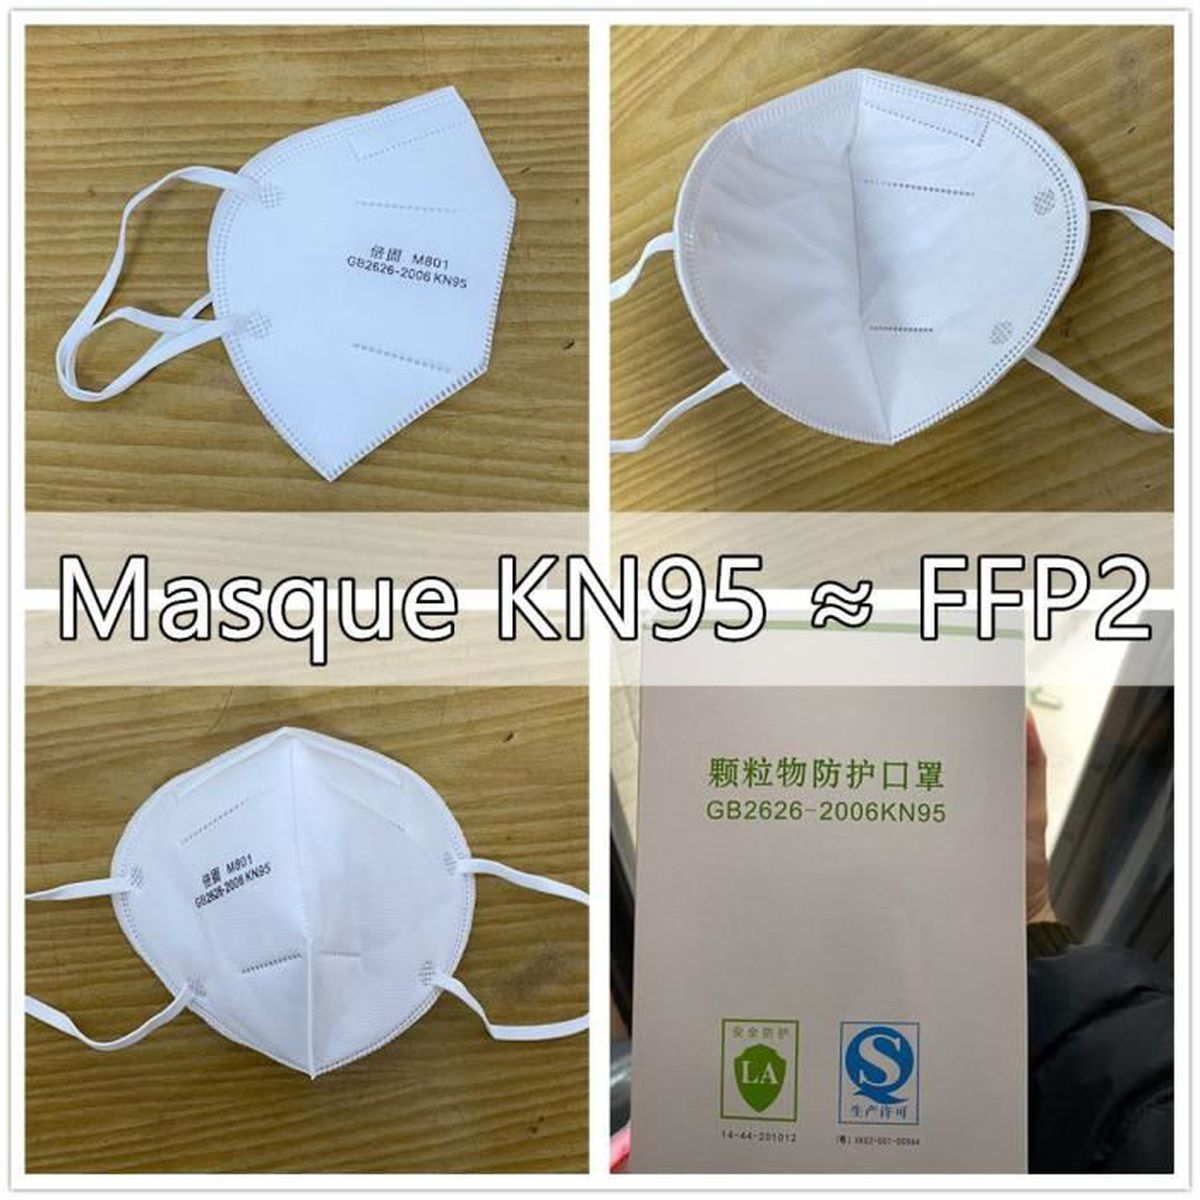 masque buccal ffp2